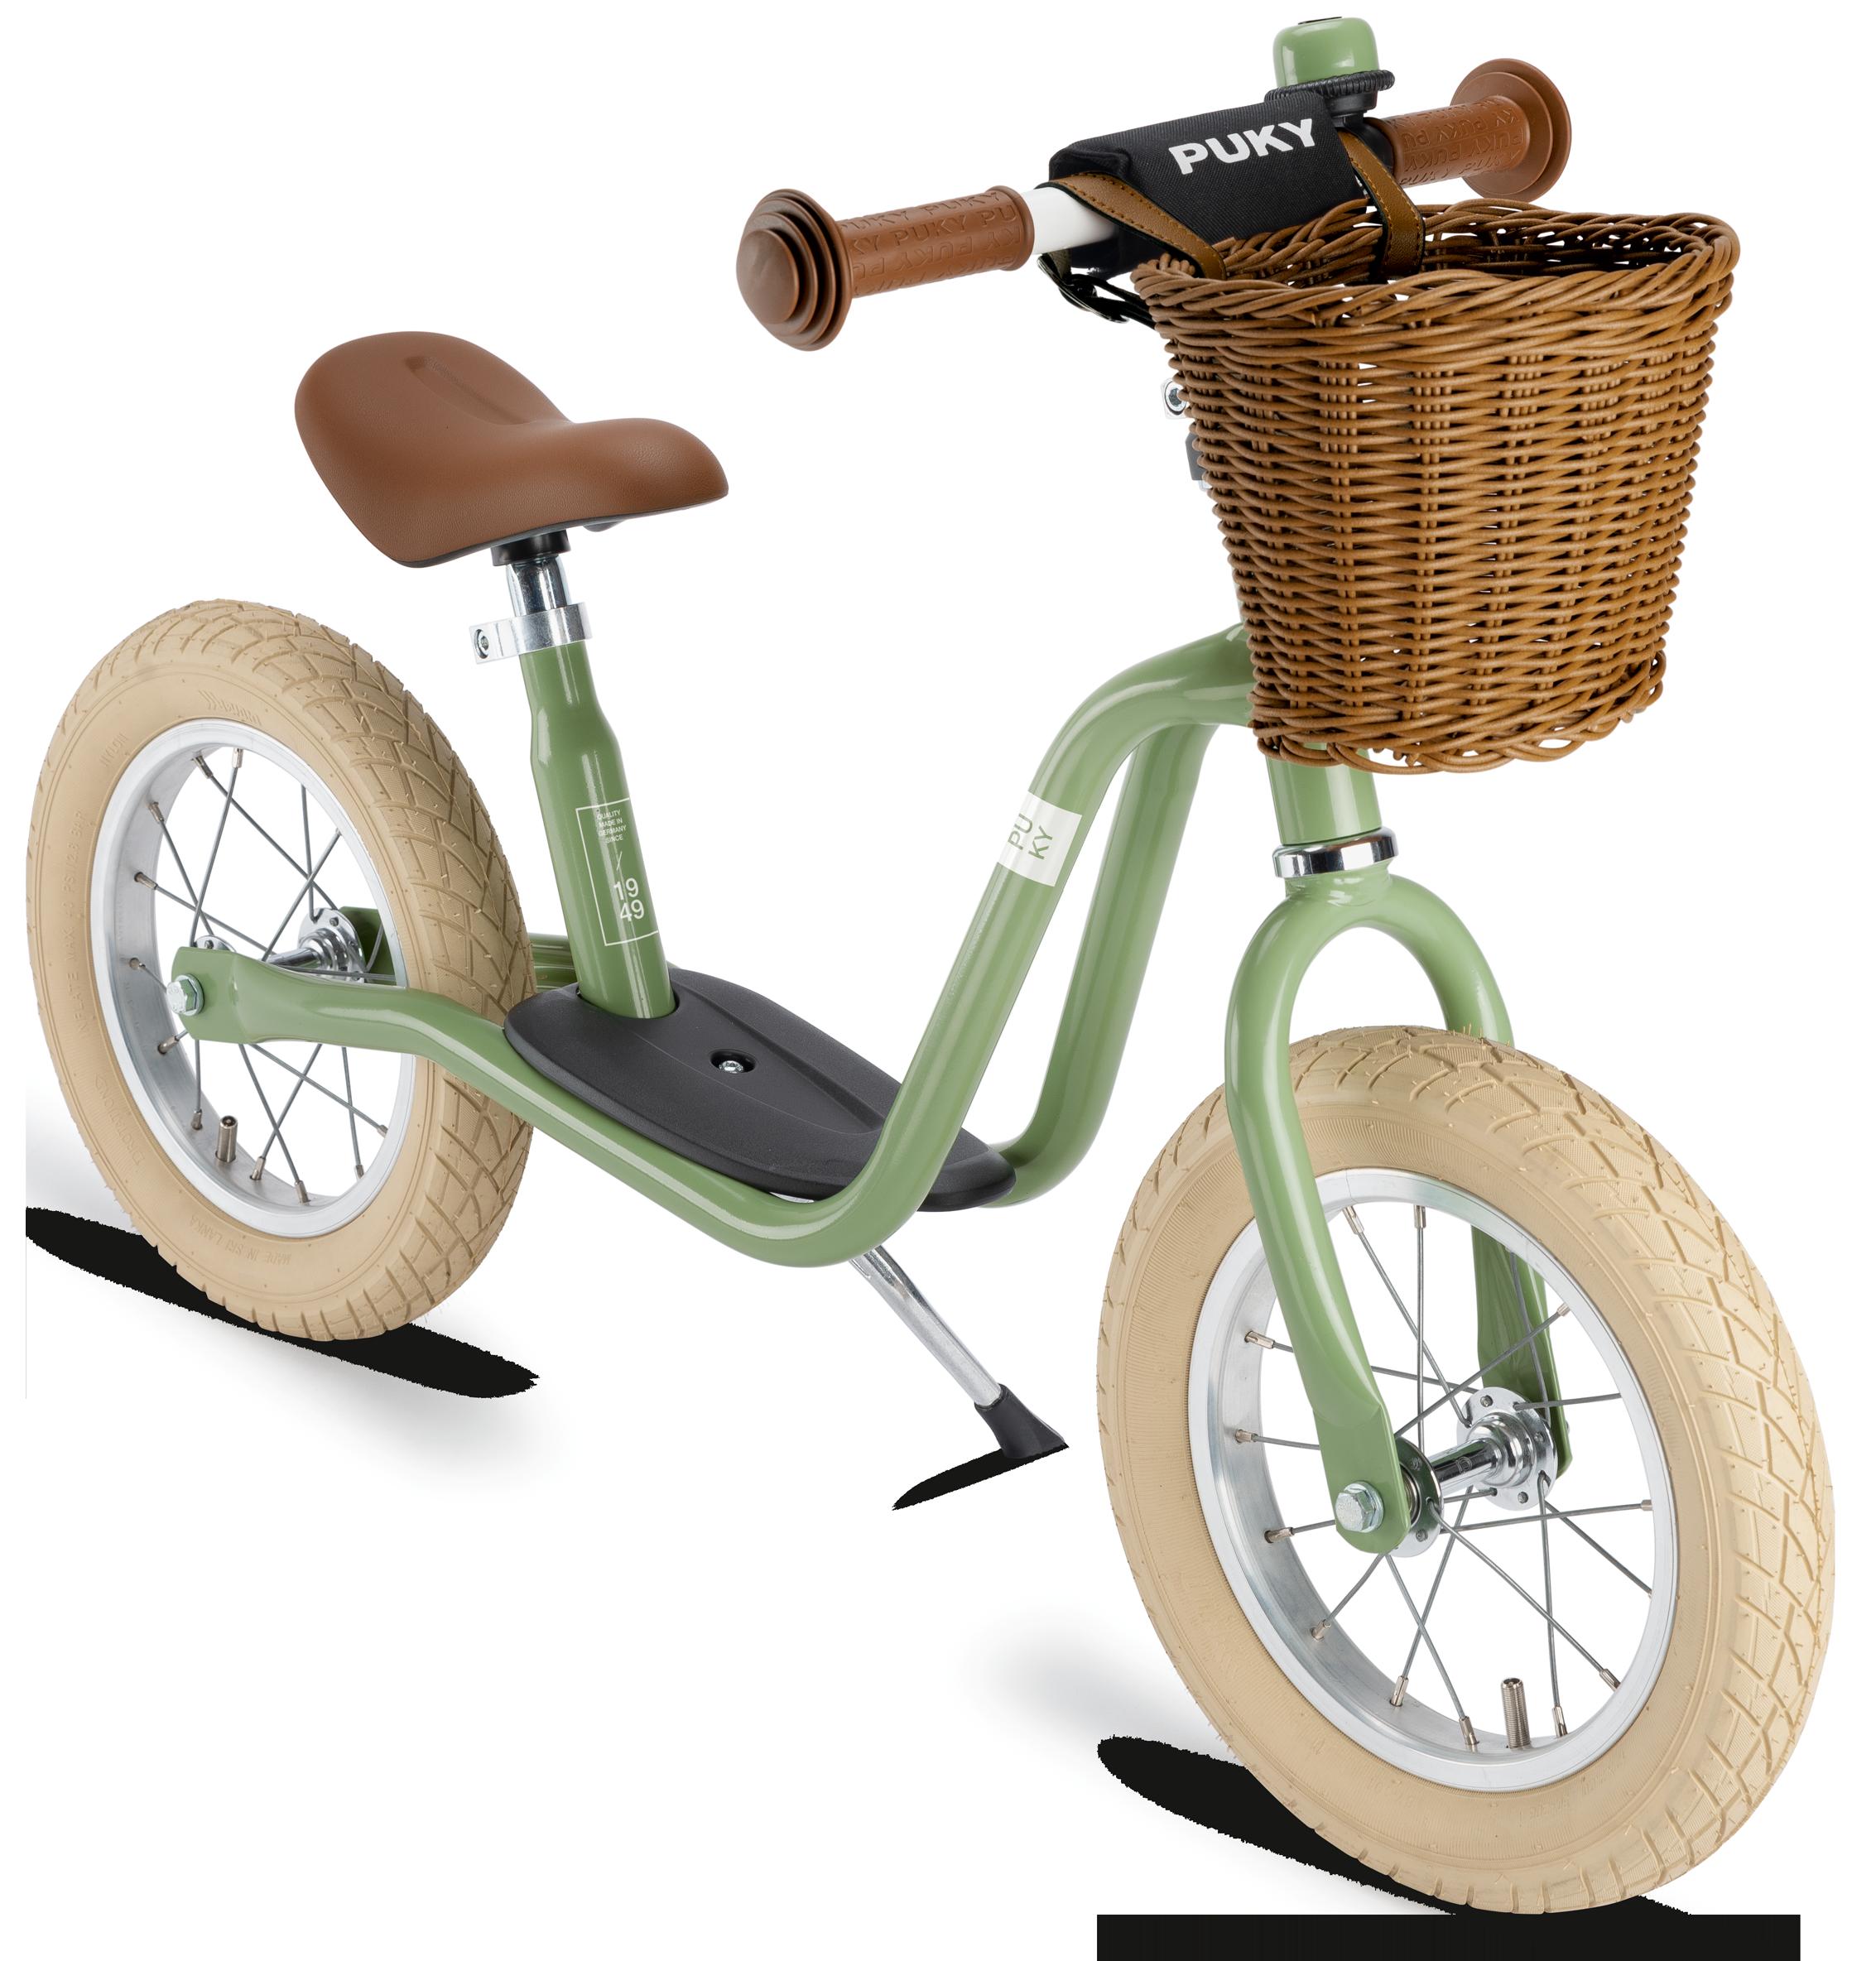 Puky LR XL CLASSIC Løbecykel - Grøn